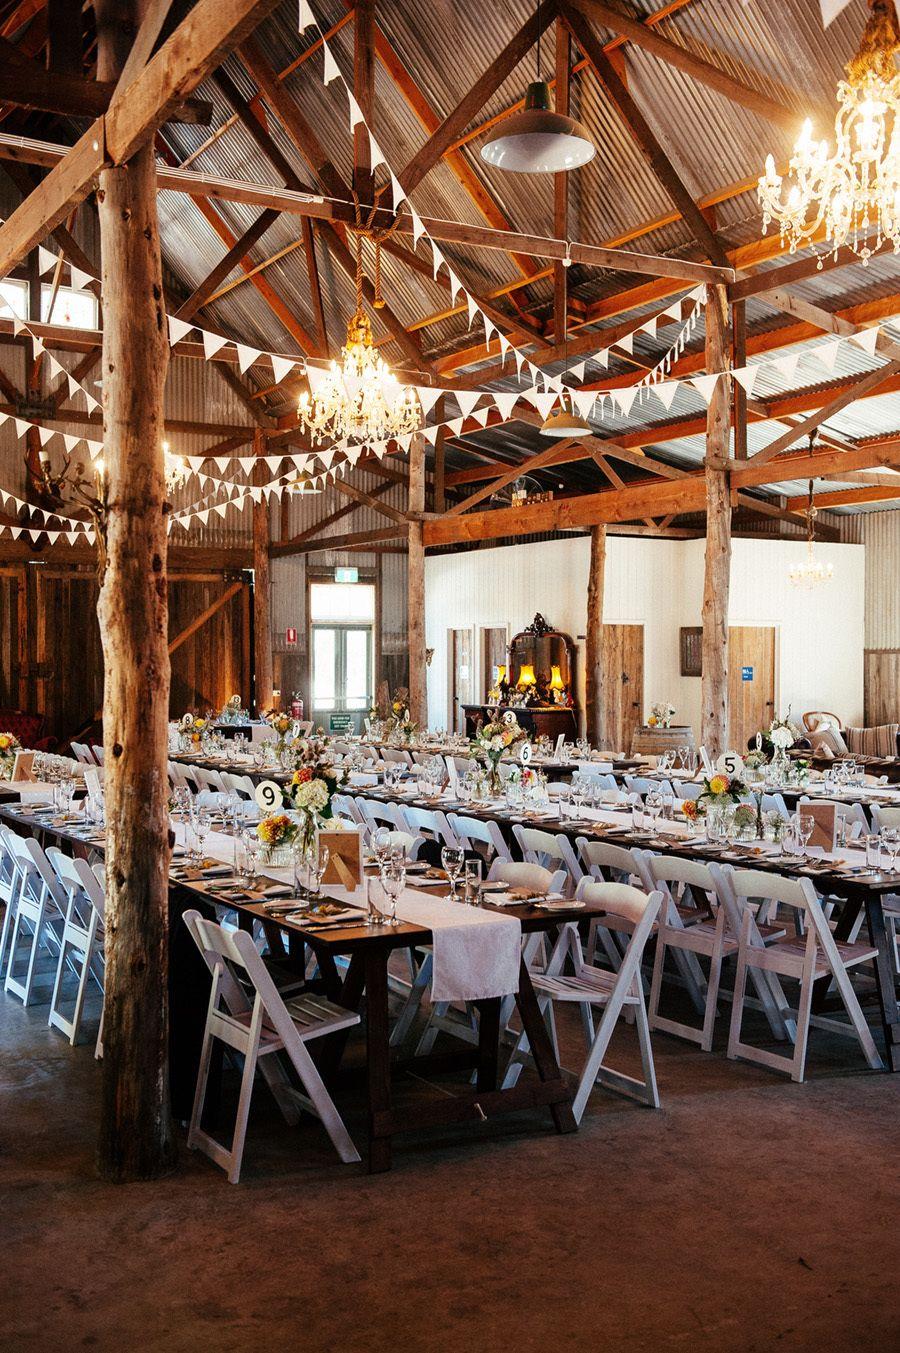 Laid Back, Rustic Barn Wedding | Rustic barn, Wedding ...